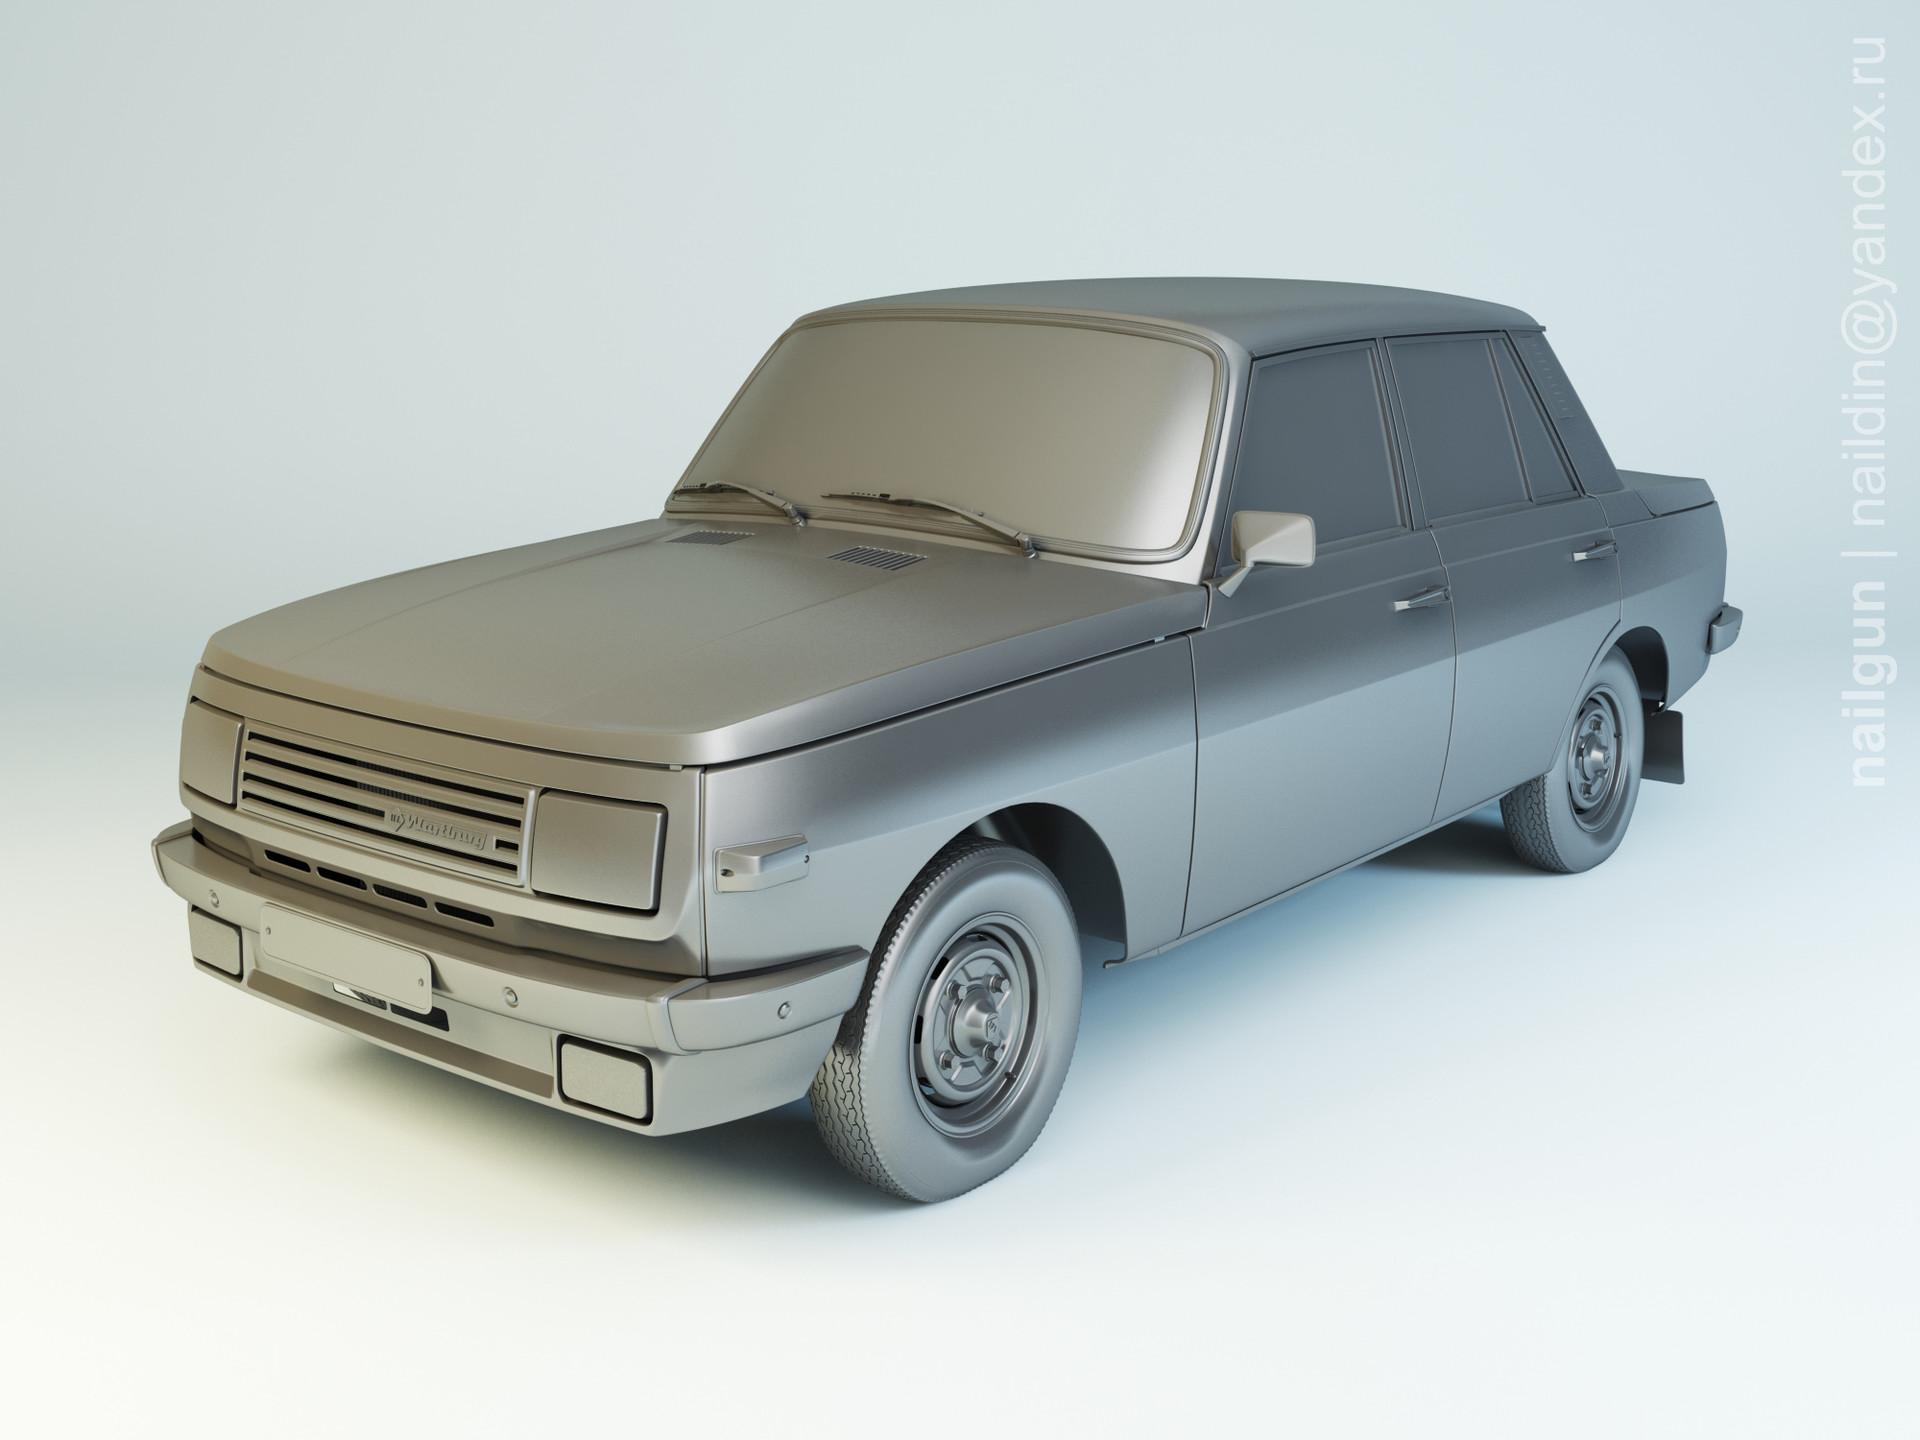 Nail khusnutdinov als 156 002 wartburg 353w modelling 0